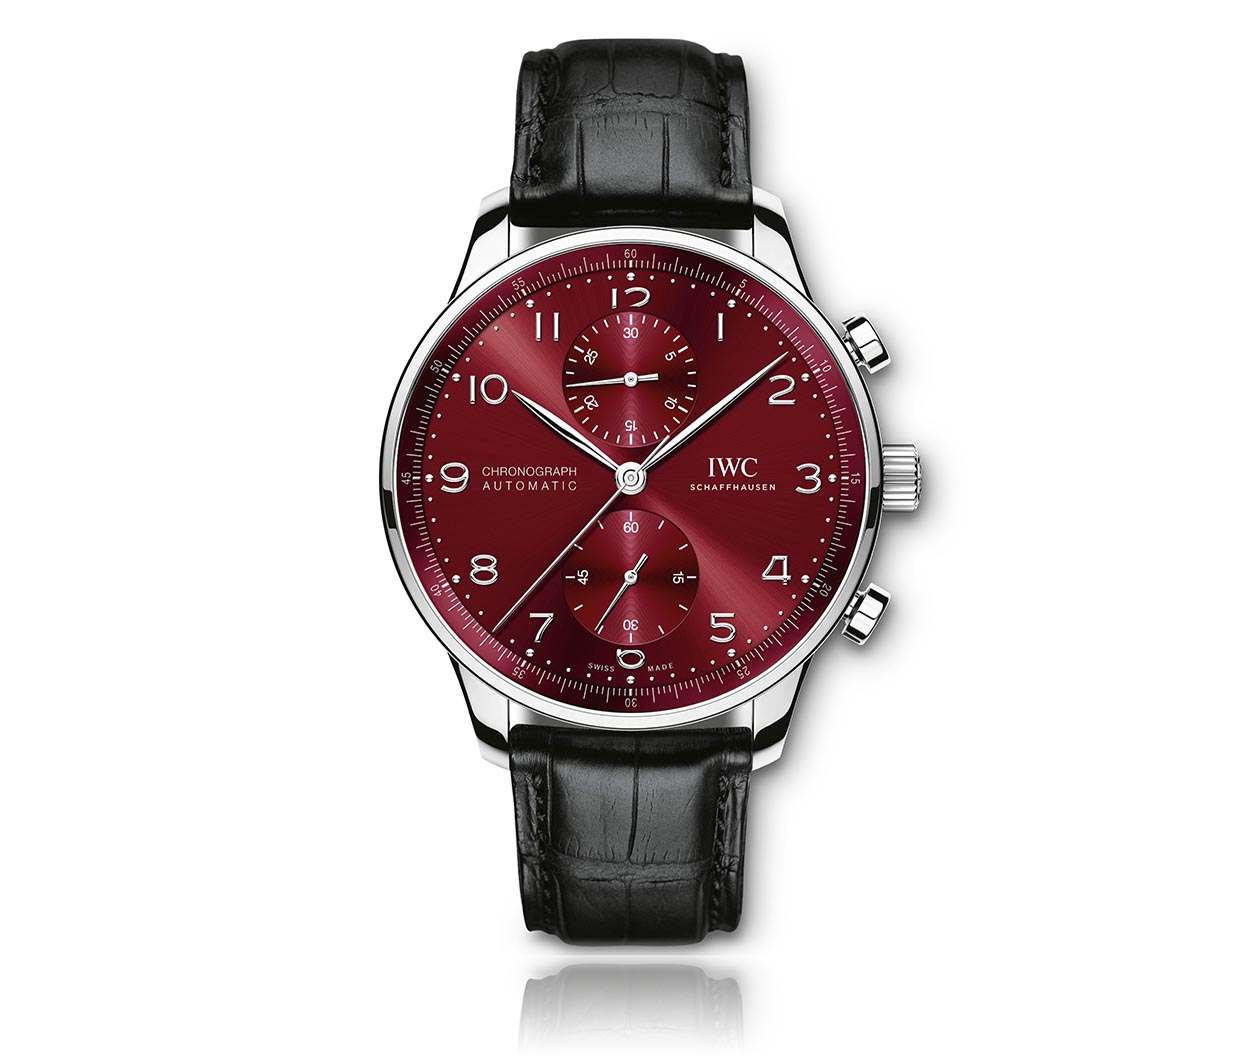 IWC Portugieser Chronograph IW371616 Carousel 1 FINAL